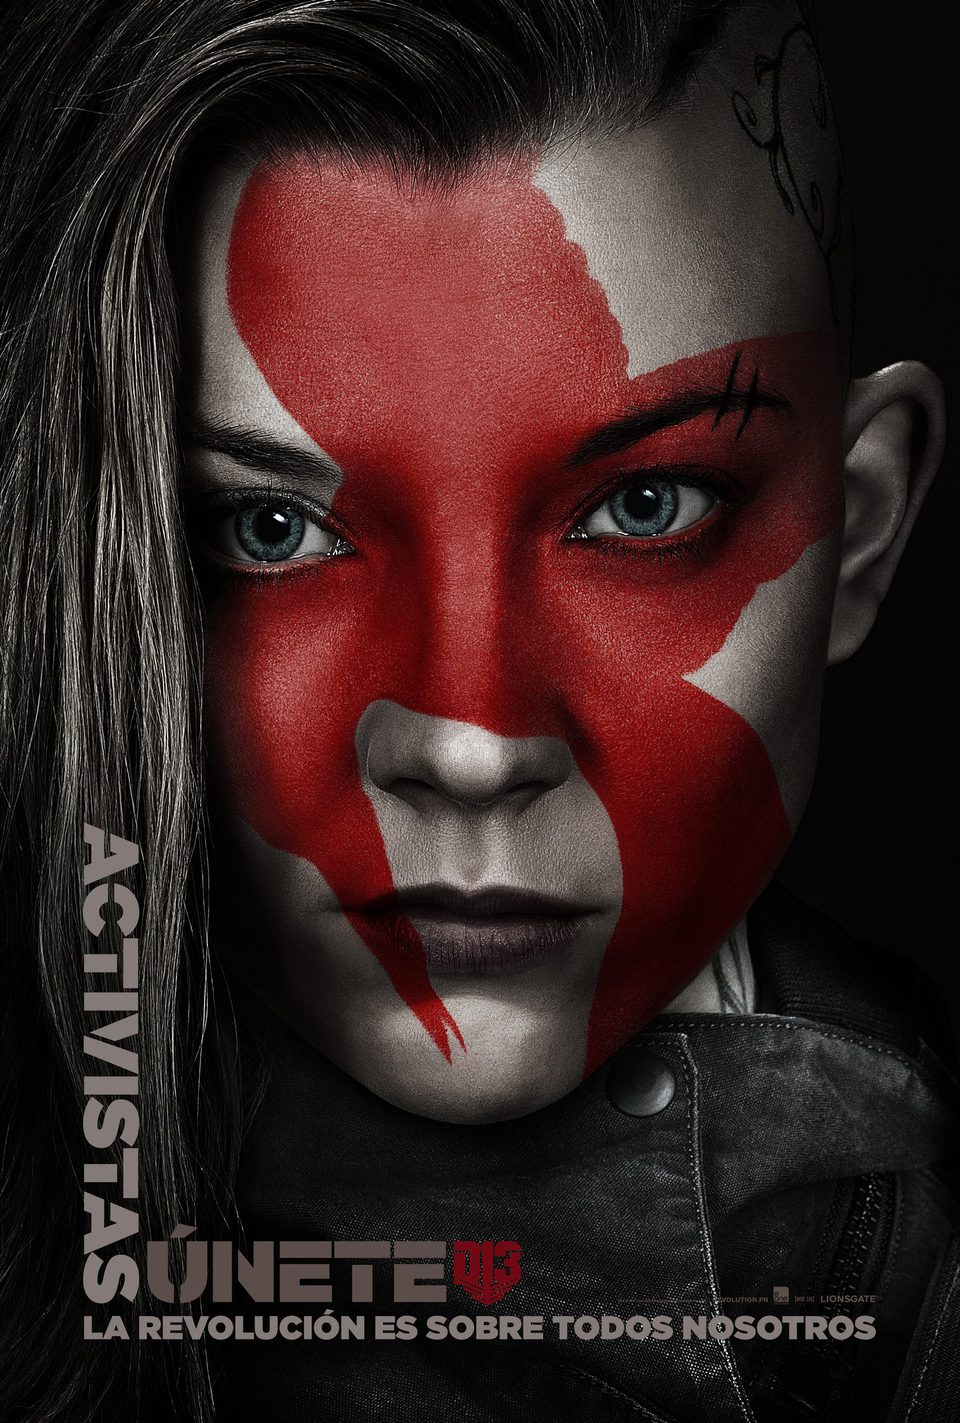 Cressida poster for The Hunger Games: Mockingjay - Part 2